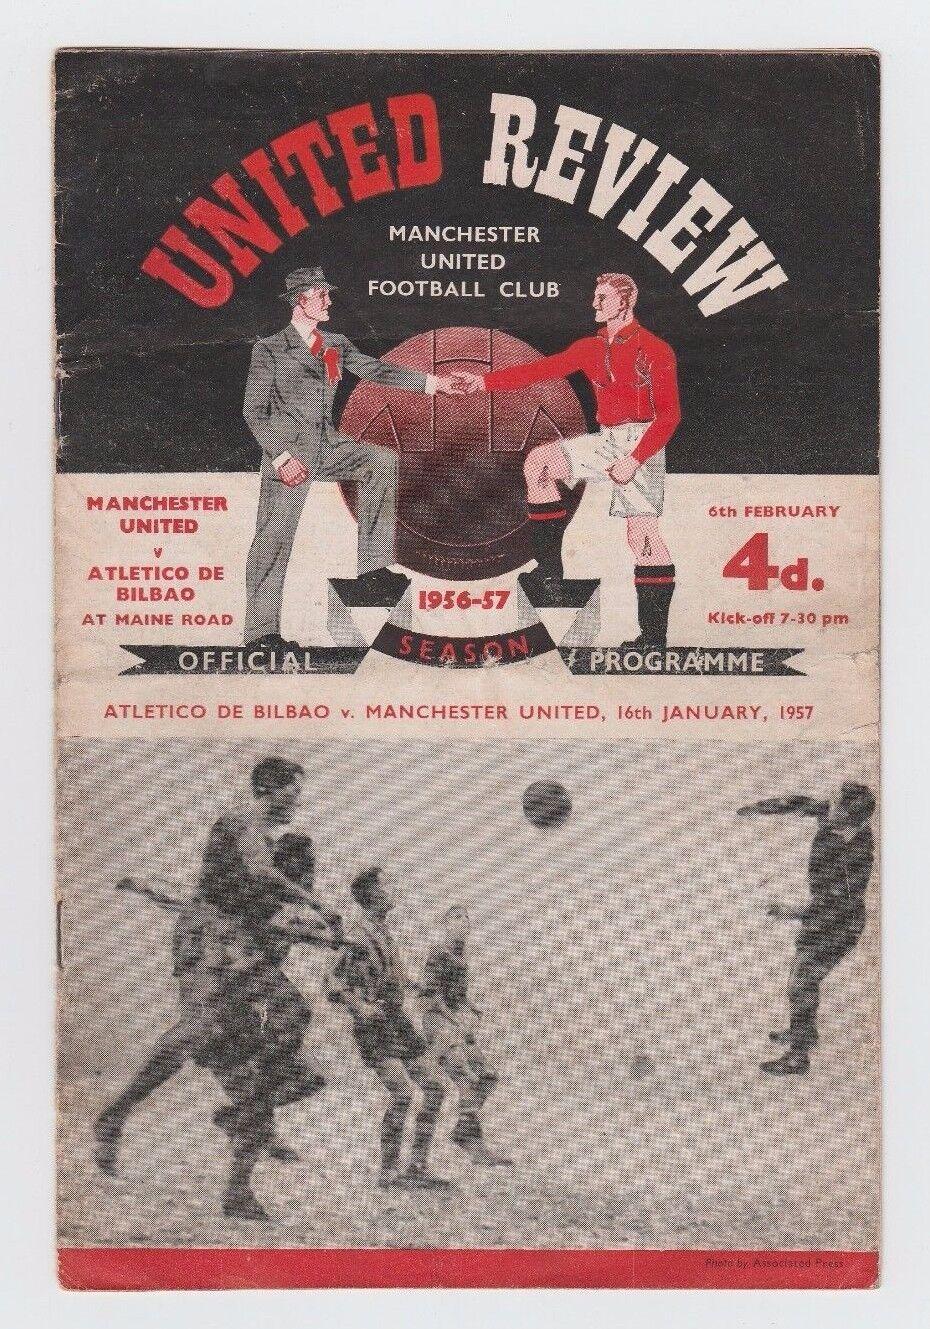 Orig.PRG   EC 1  1956 57  MANCHESTER UNITED - ATLETICO BILBAO  1 4 FINALE    TOP